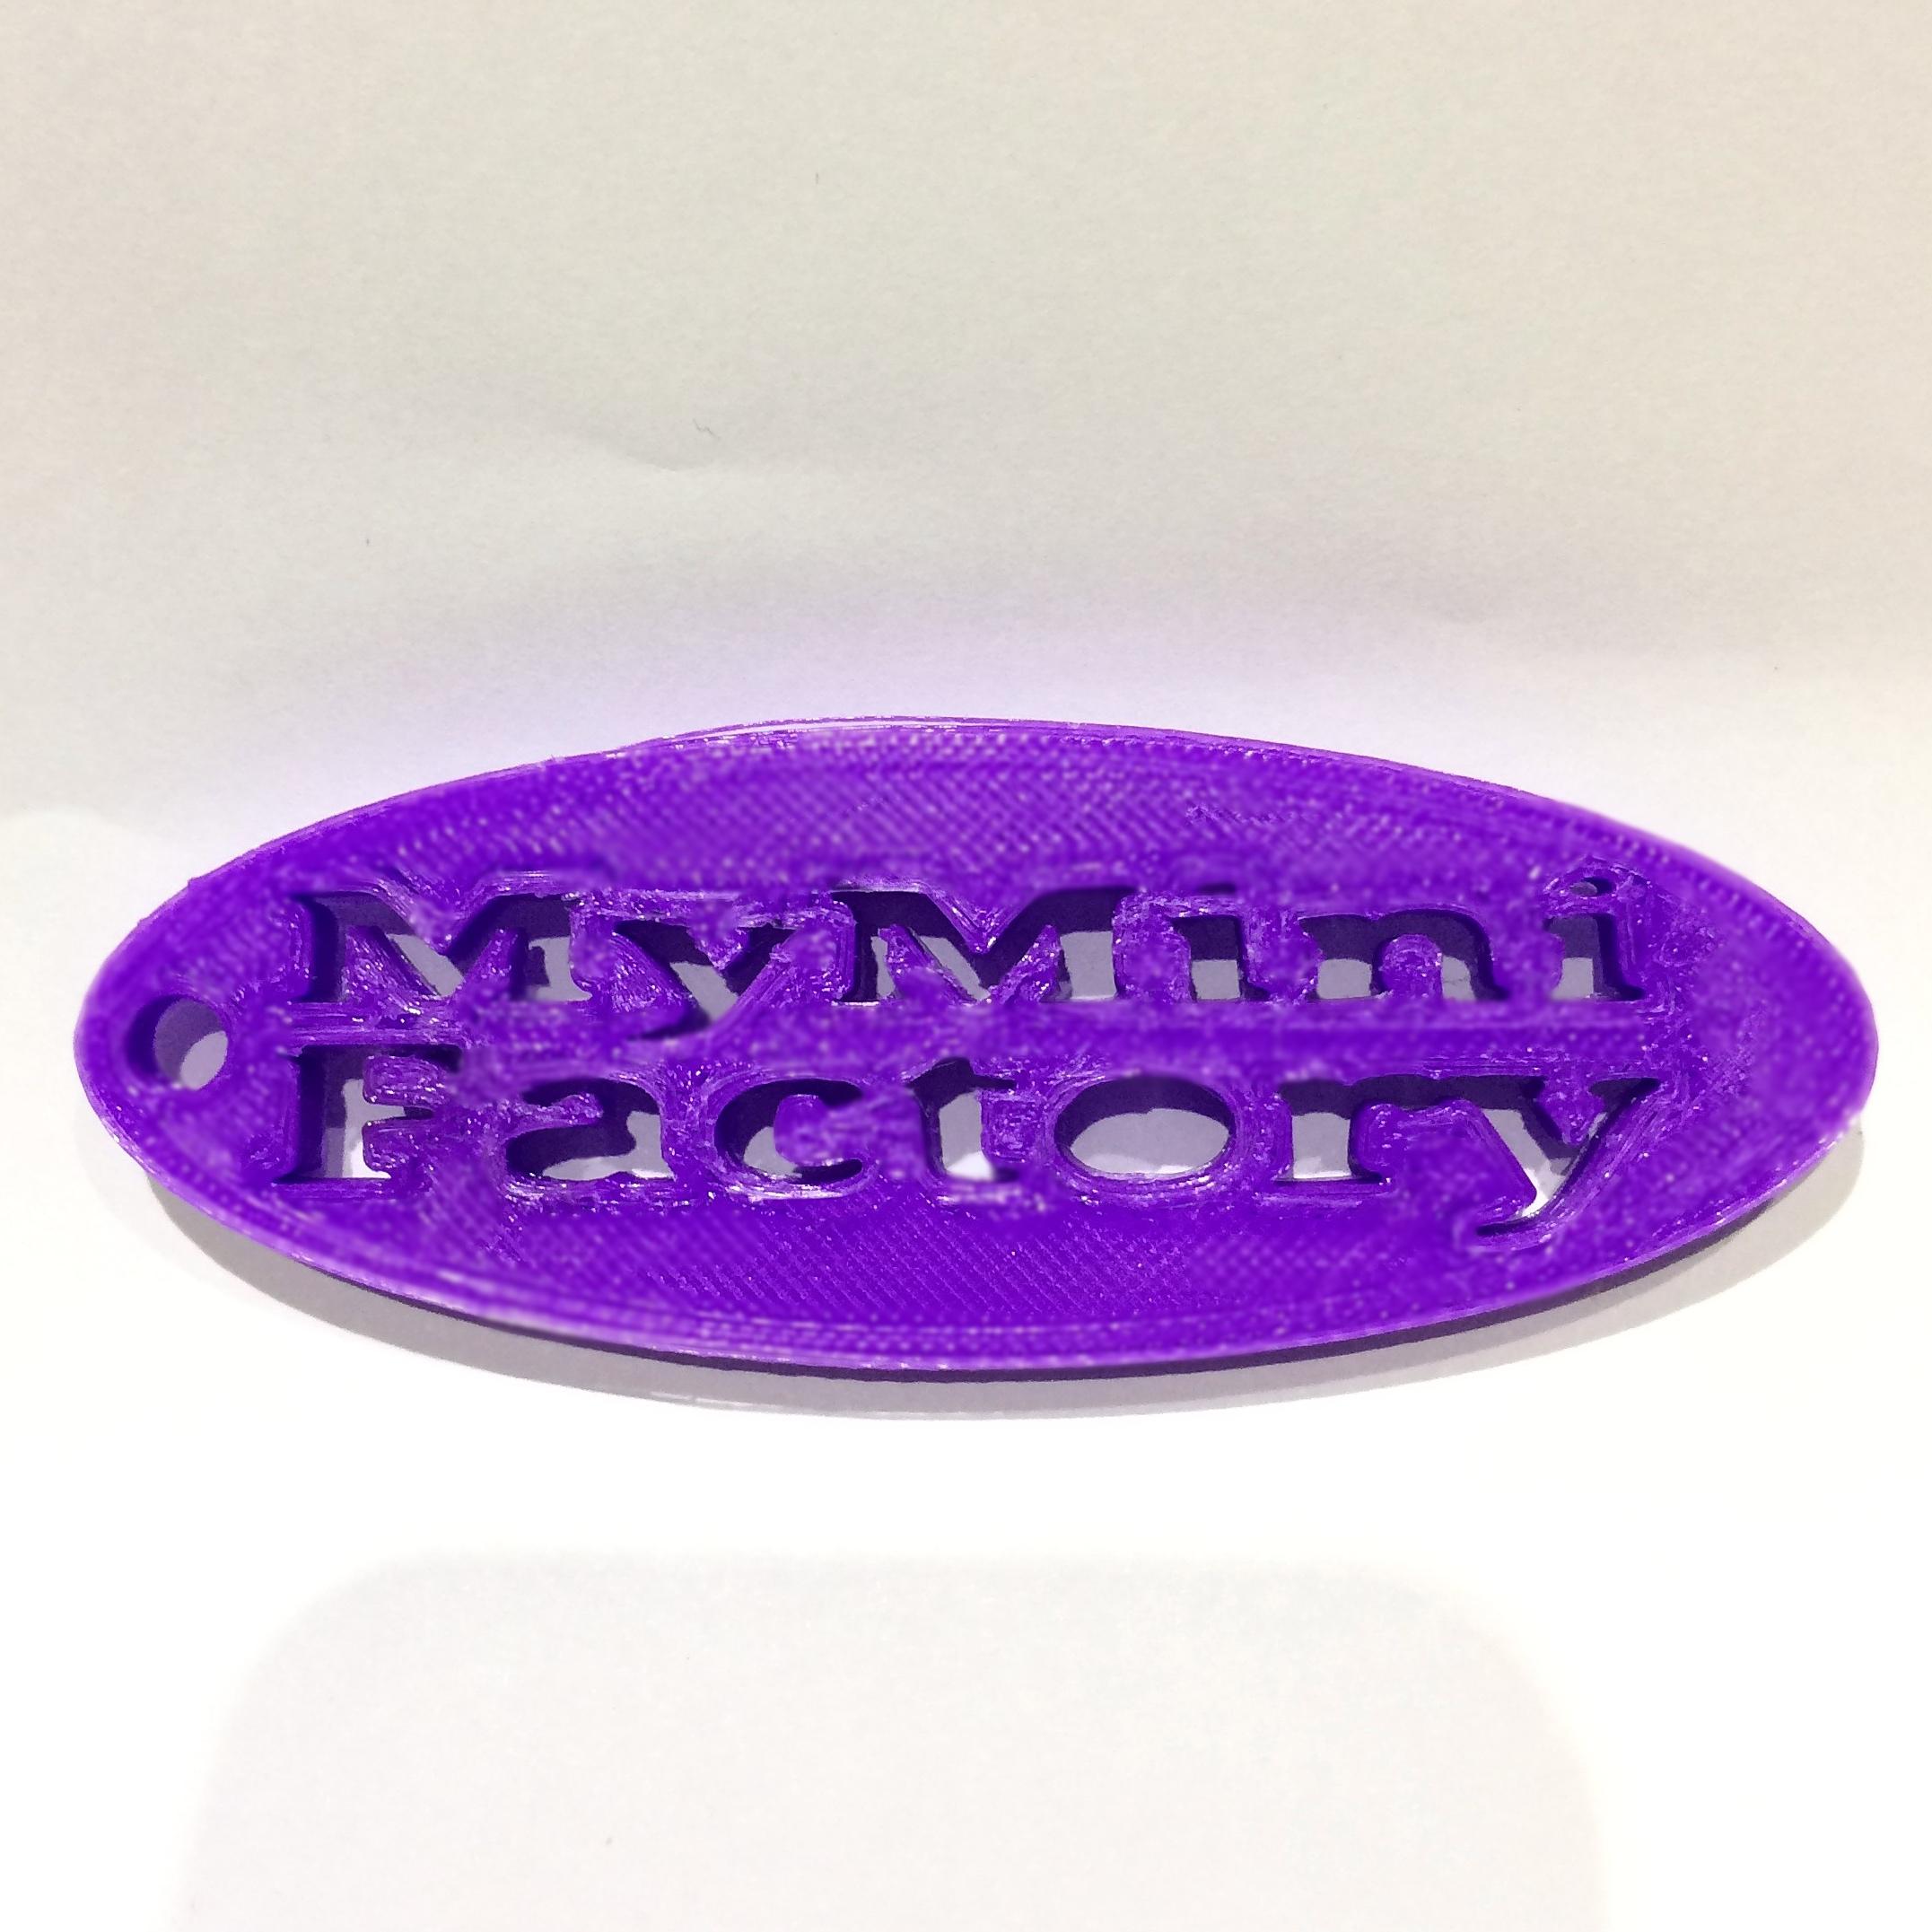 MyMiniFactory_keychain image